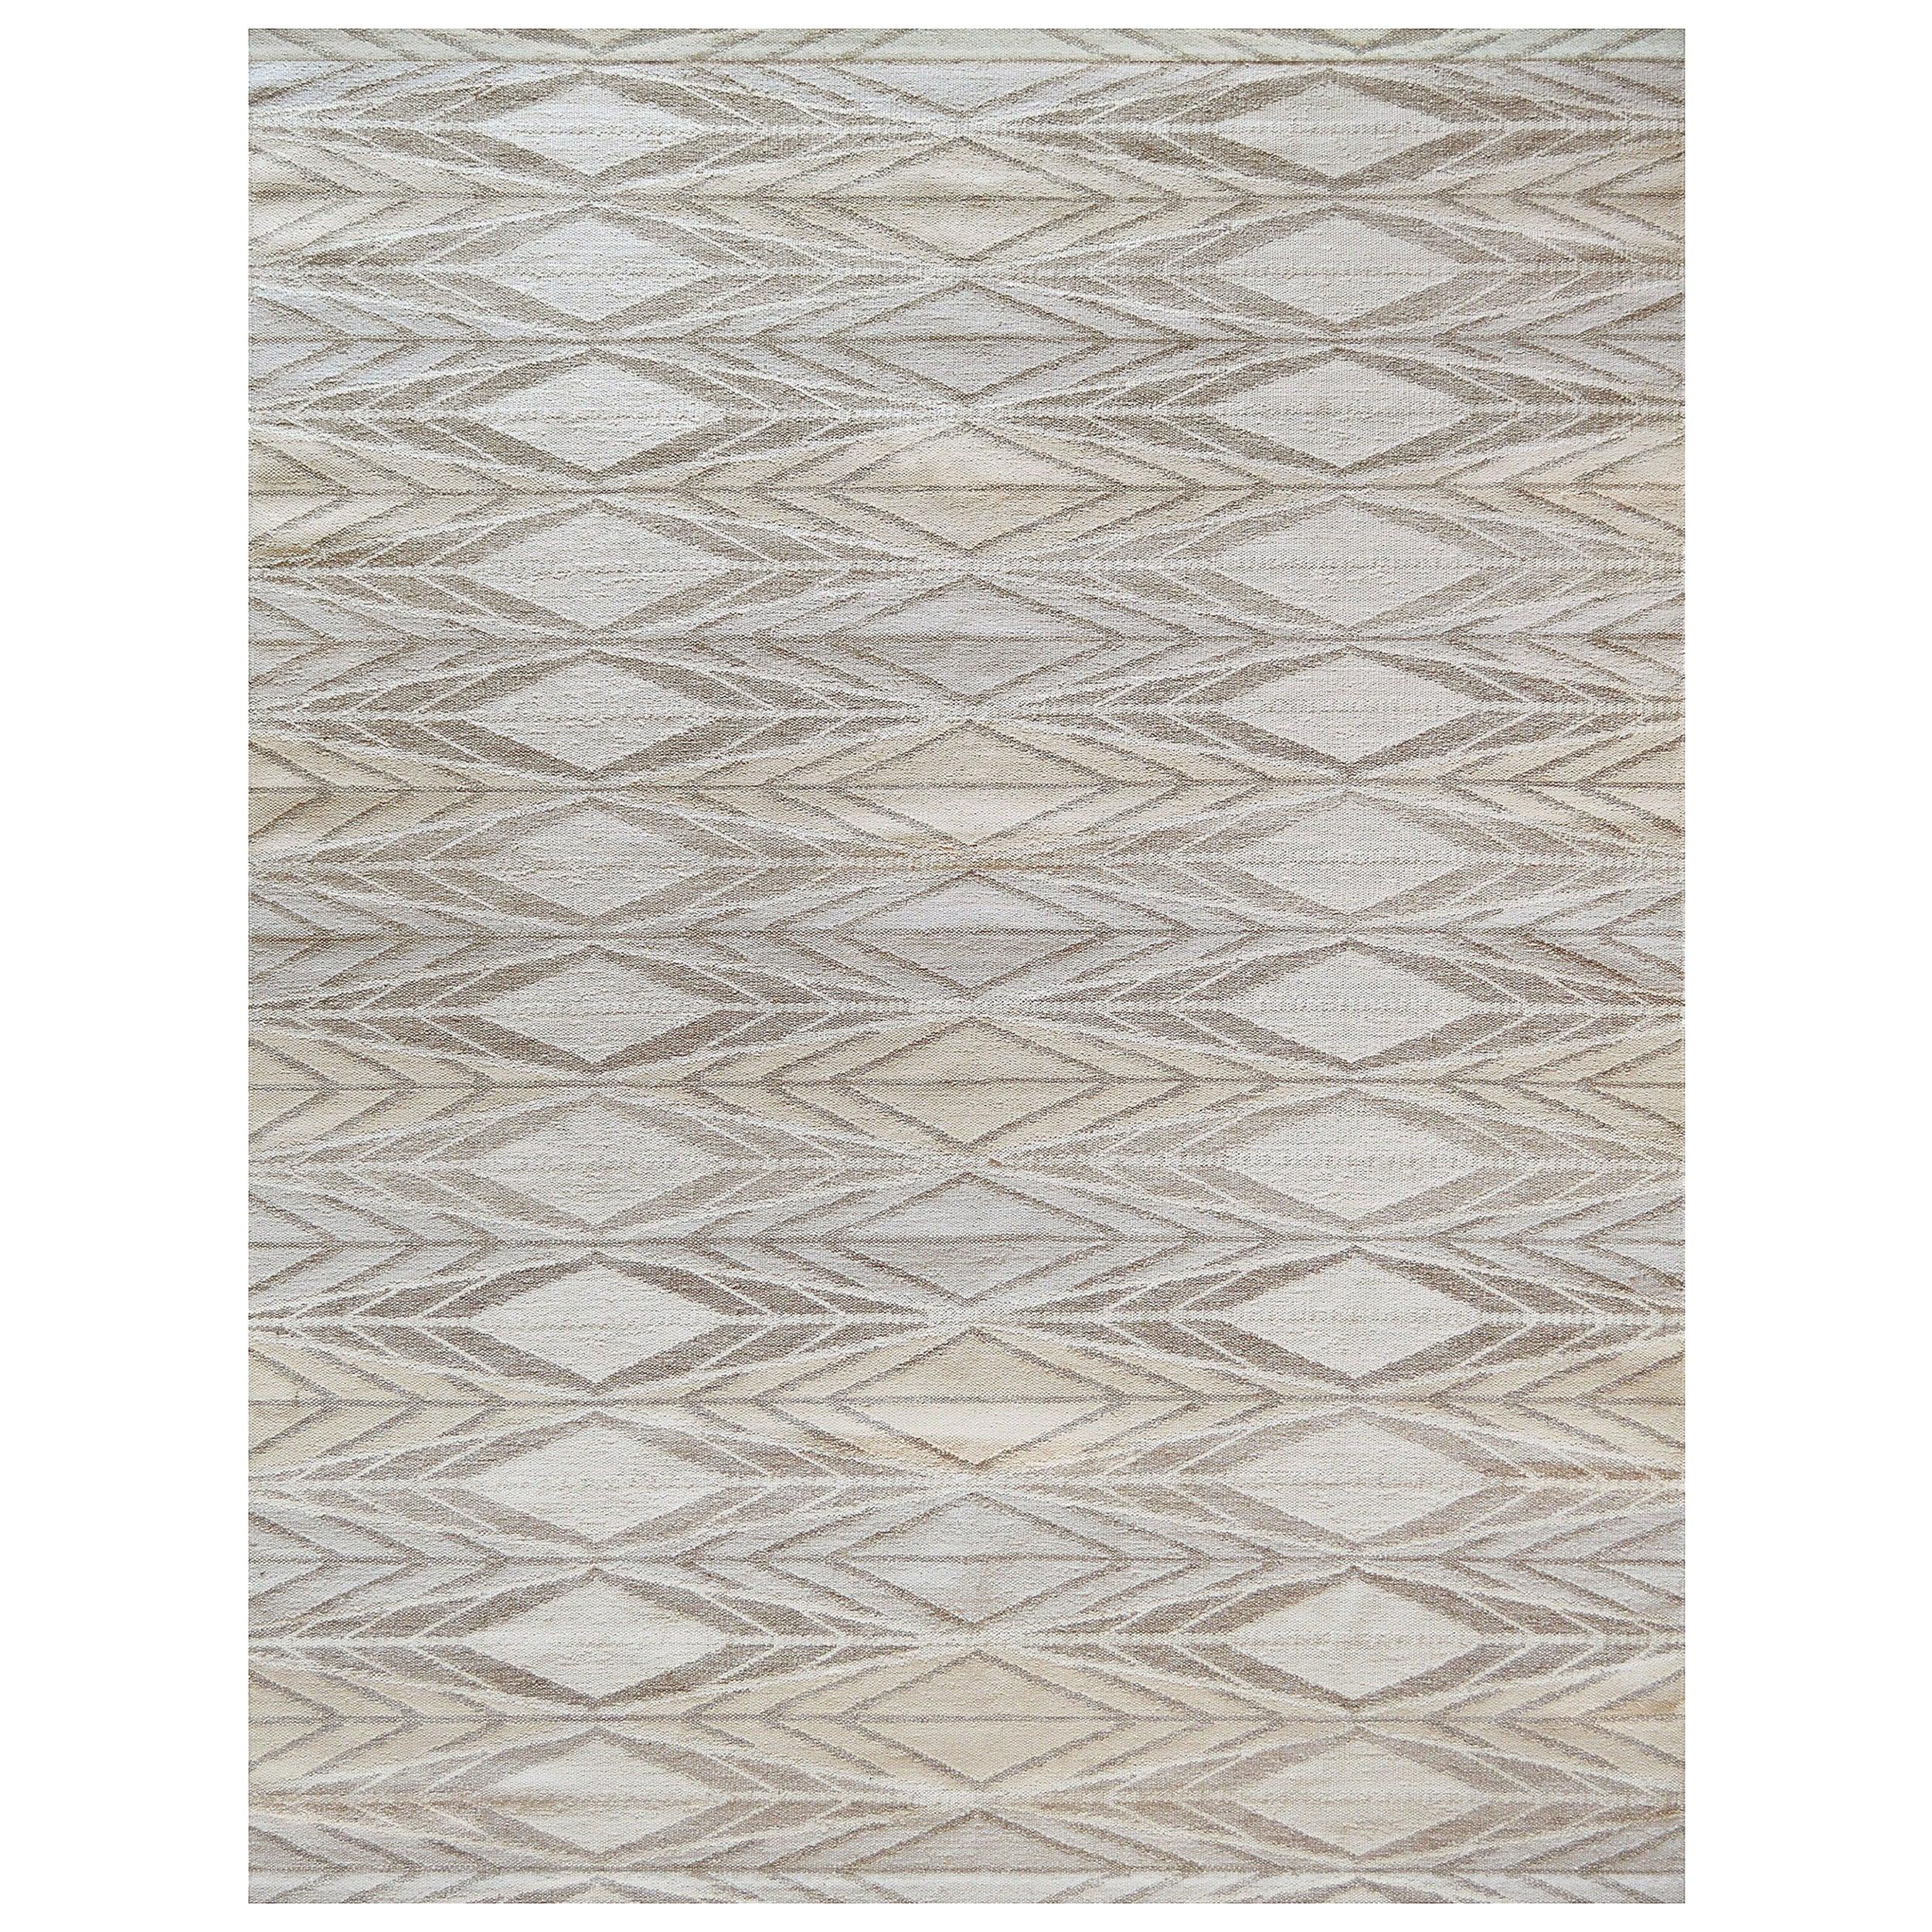 Handwoven Swedish Kilim Inspired Wool Rug